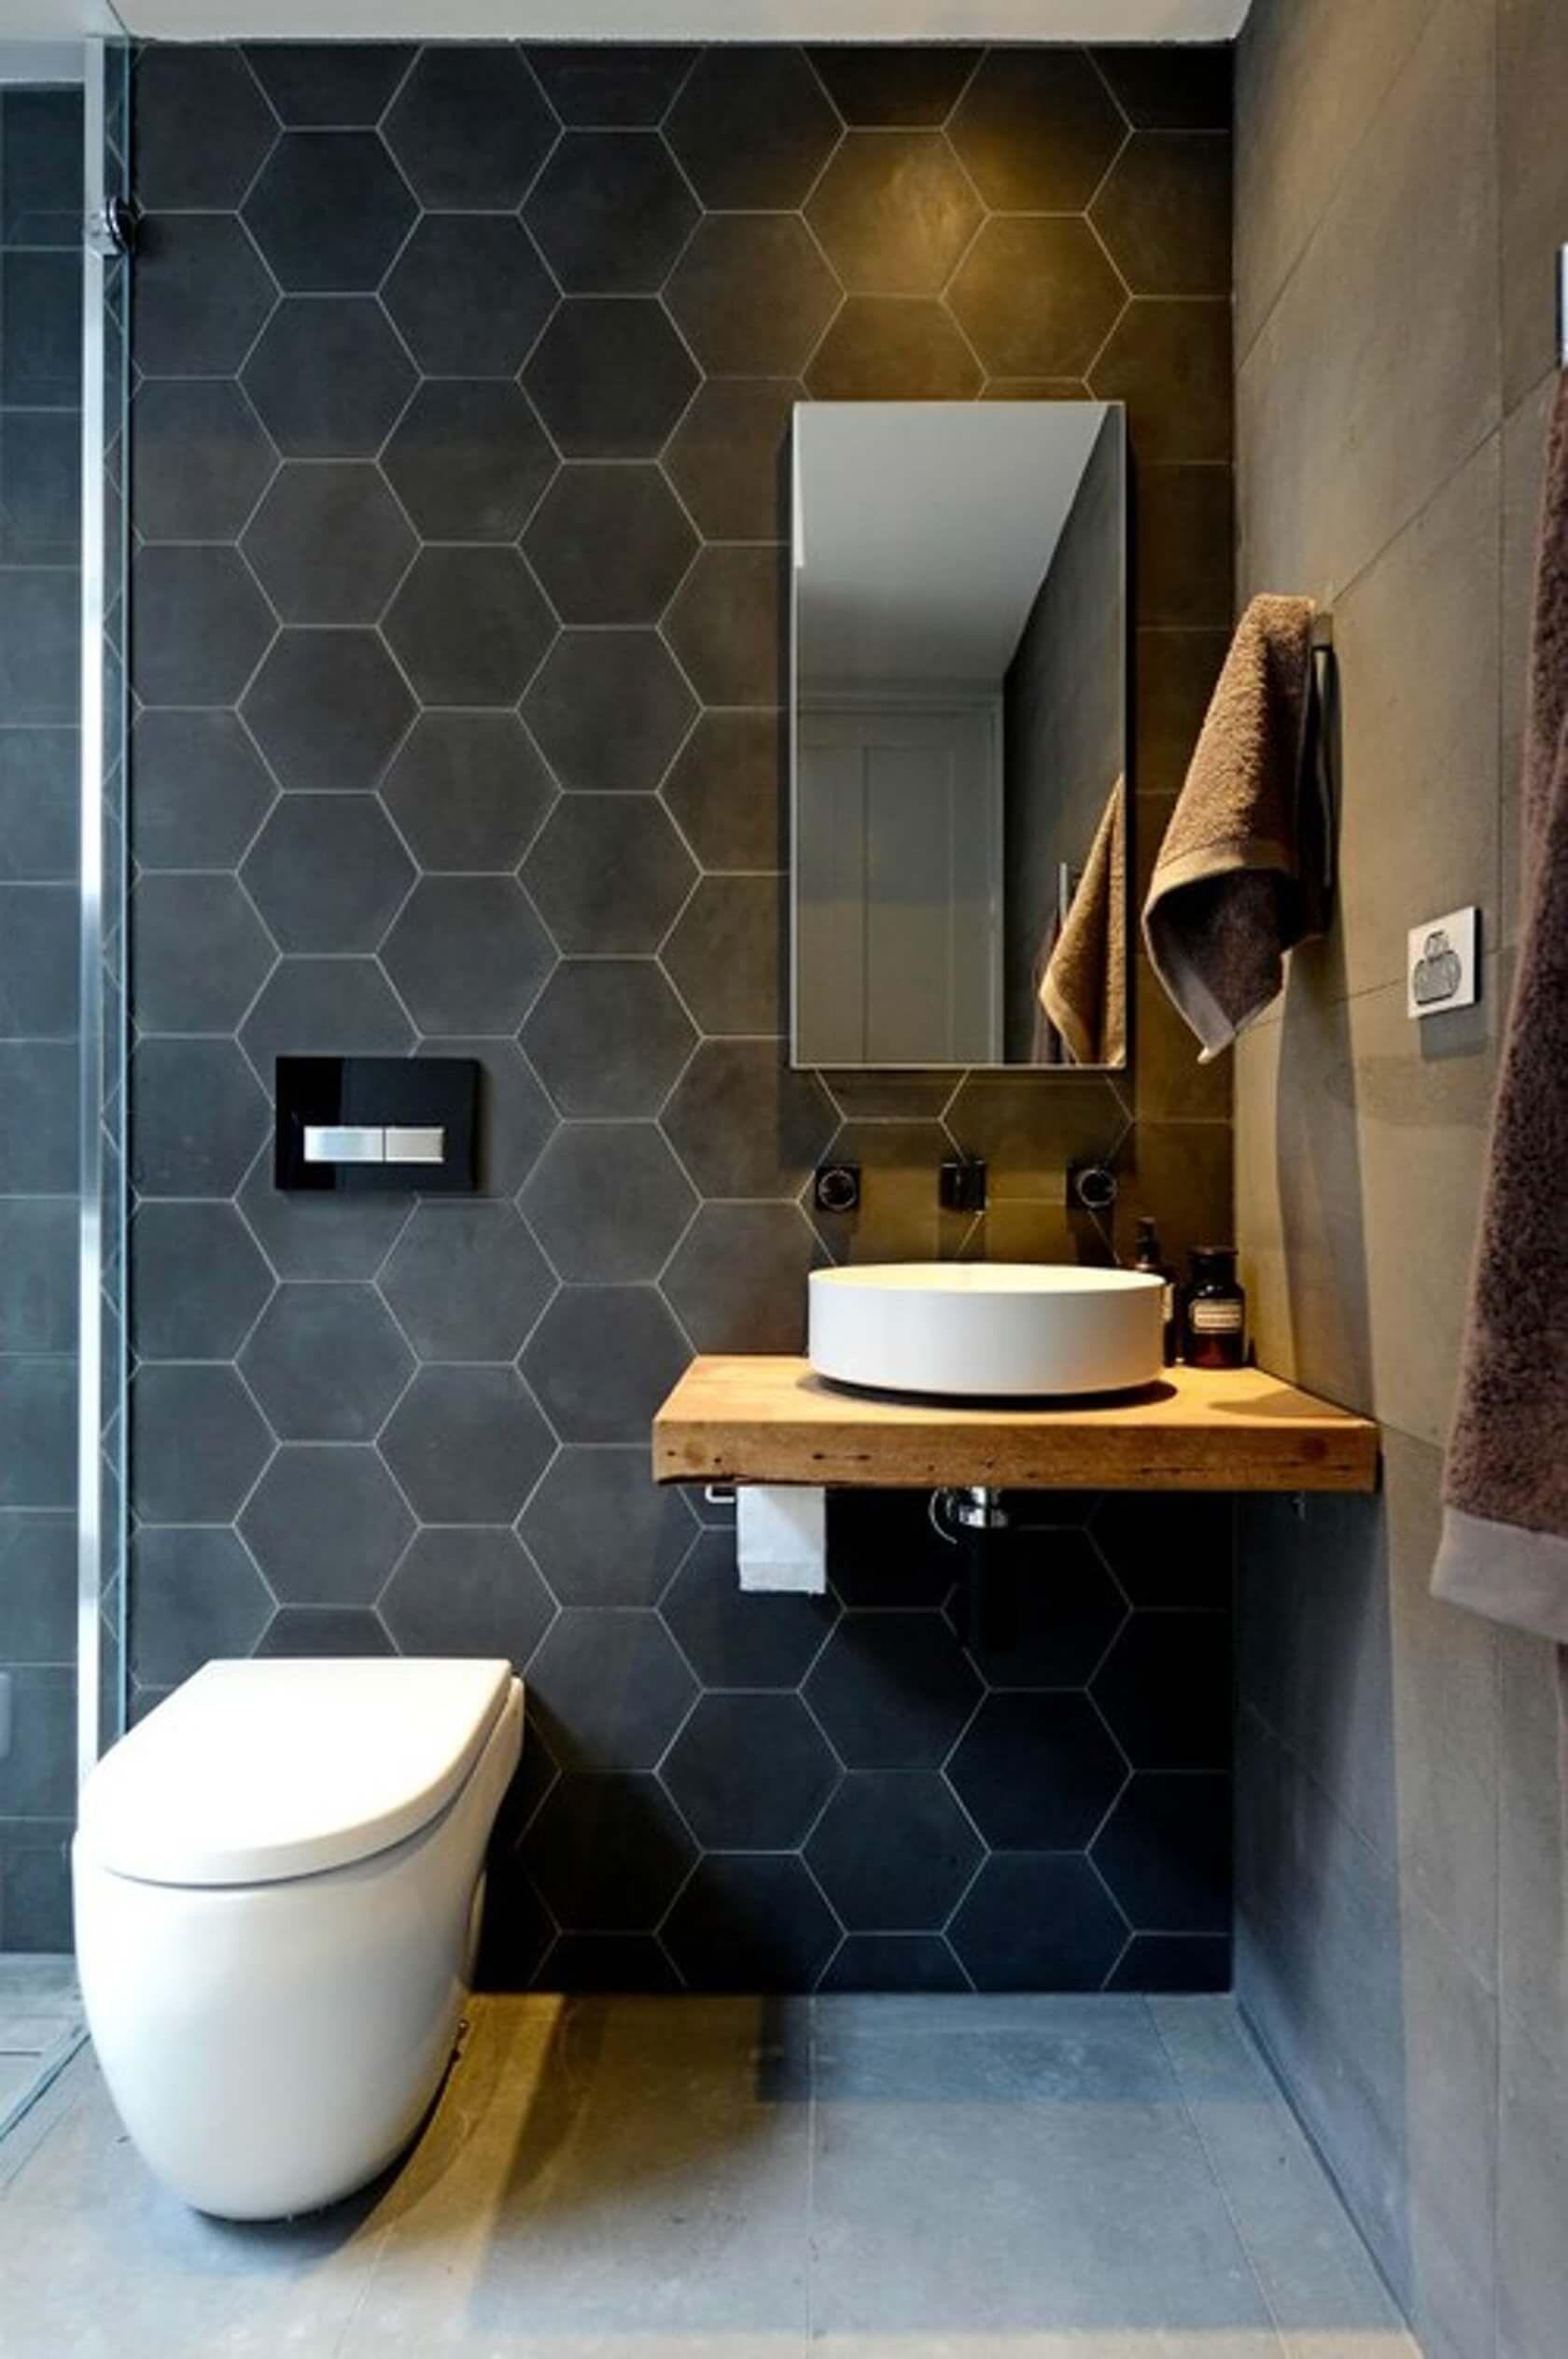 Top 35 Beautiful Small Bathroom Ideas Engineering Discoveries In 2020 Beautiful Small Bathrooms Small Bathroom Decor Masculine Bathroom Design